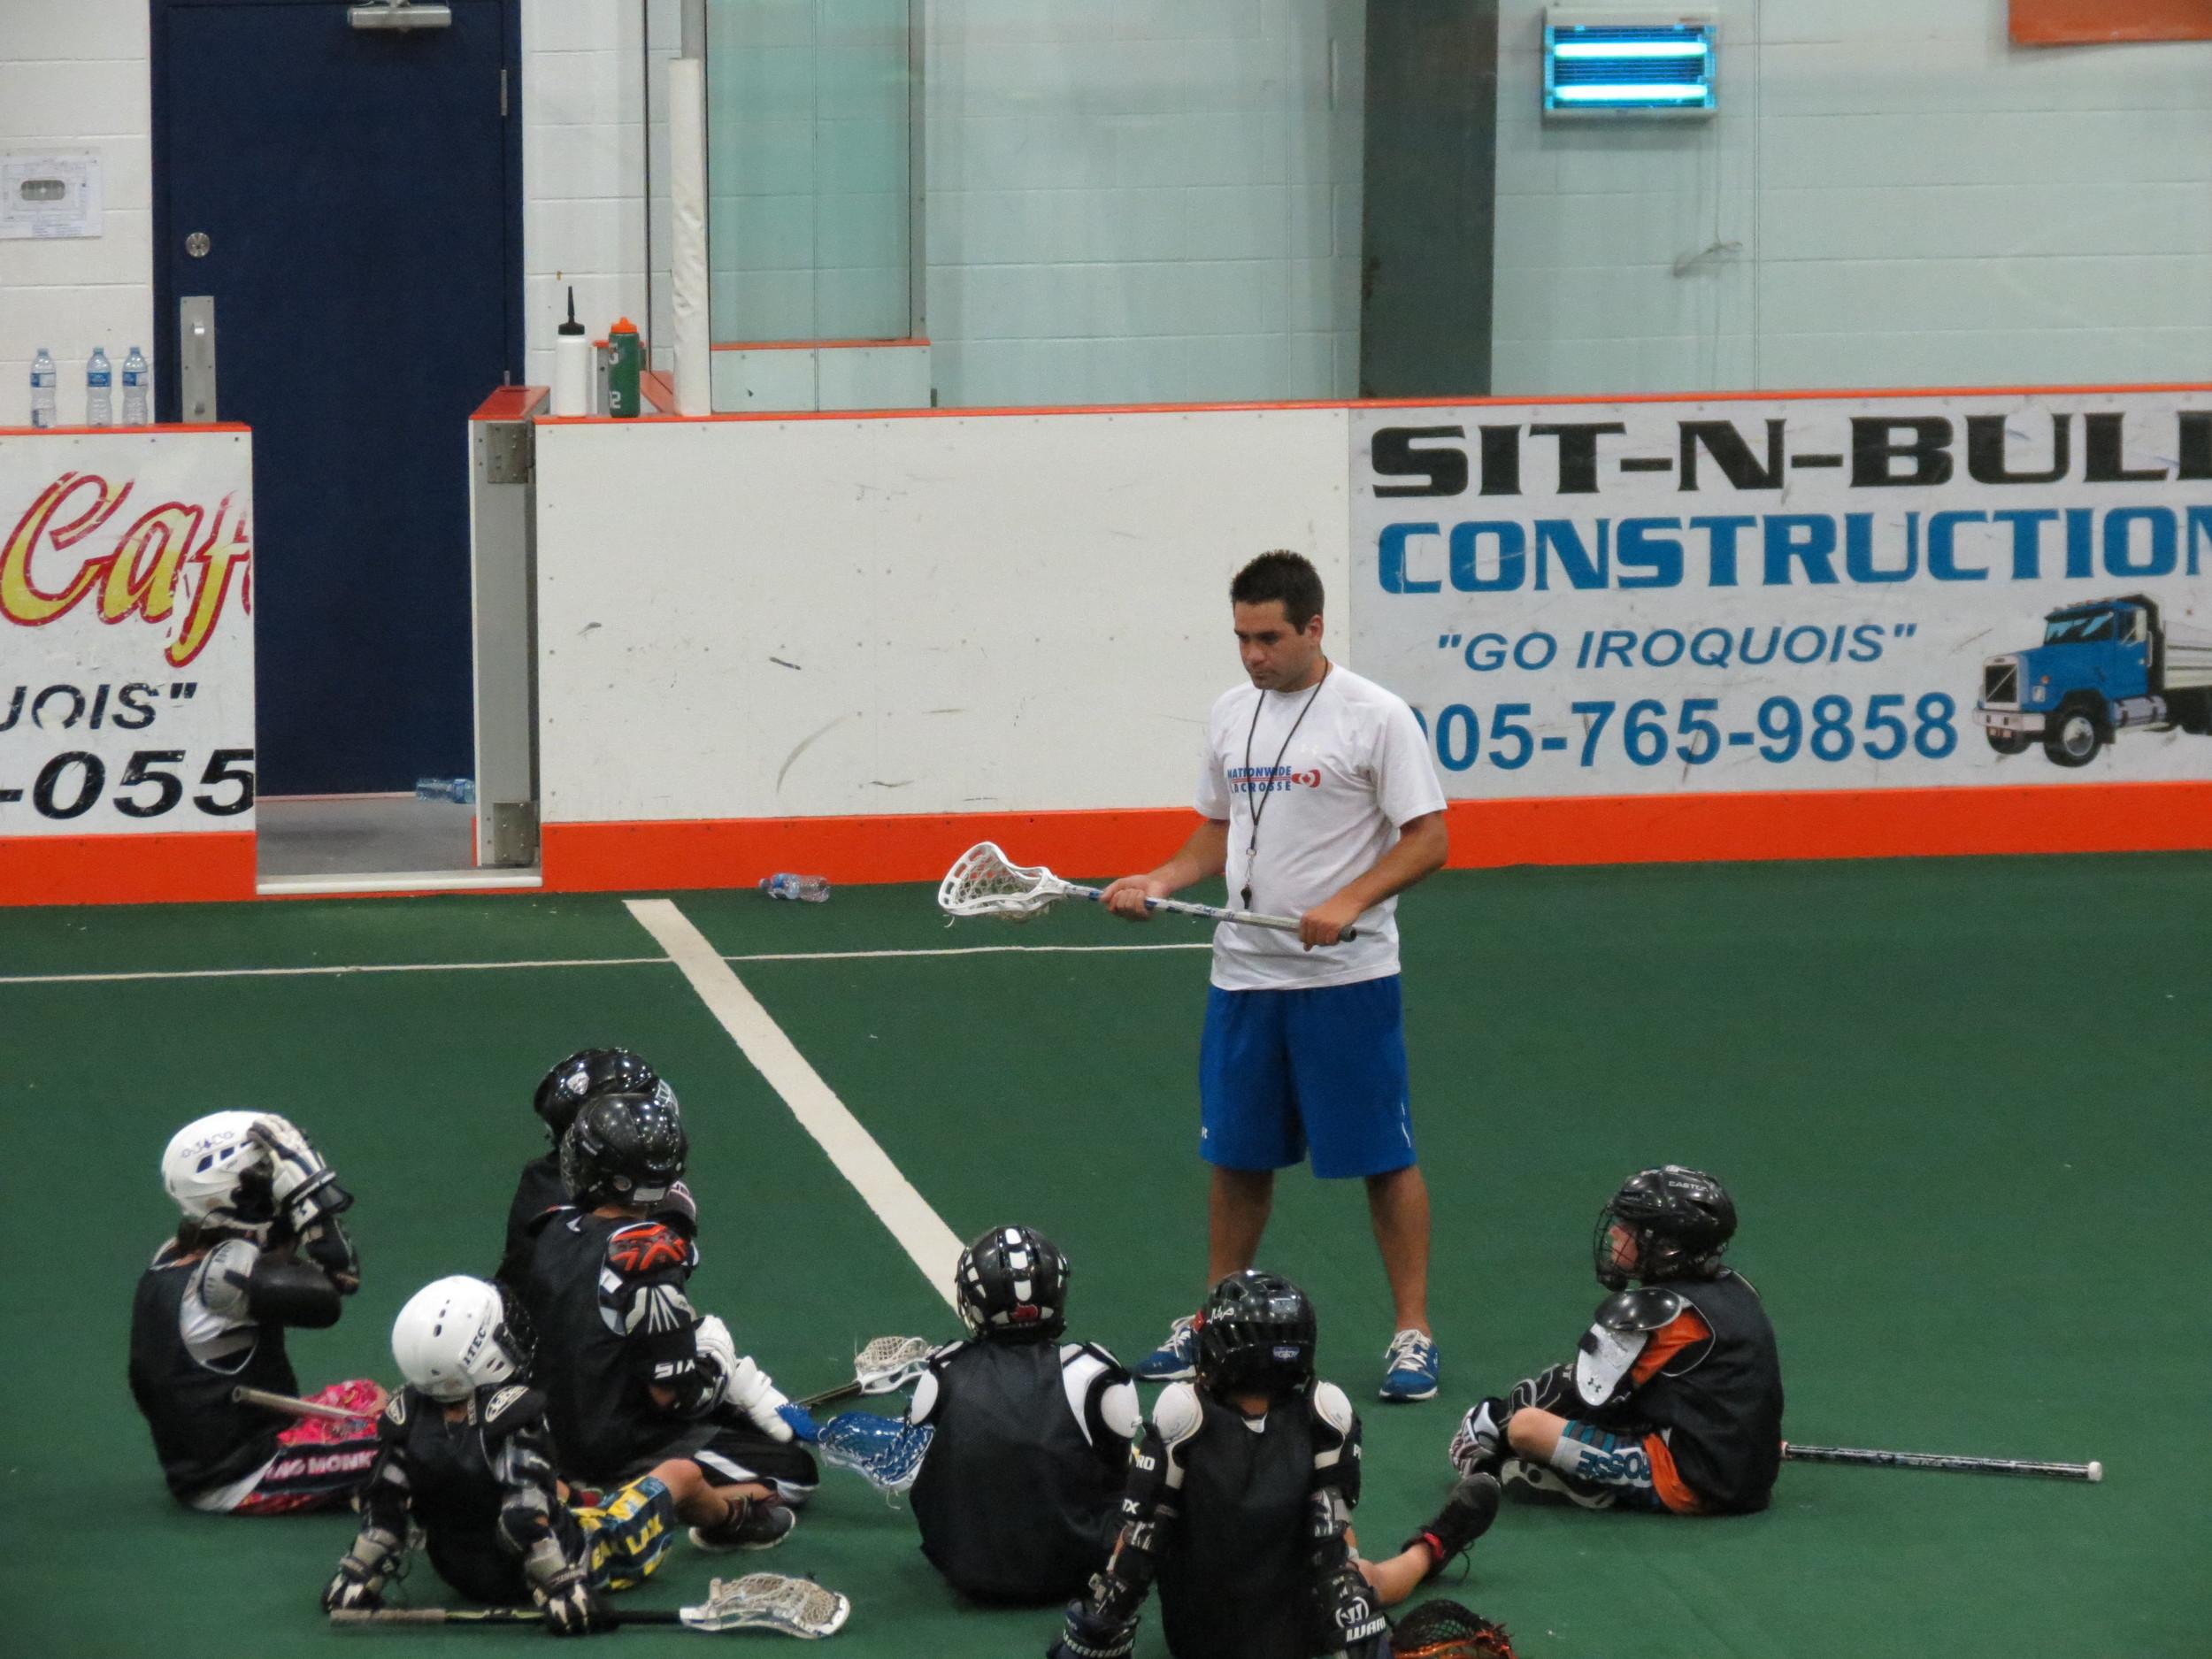 Shawn Evans instructing kids